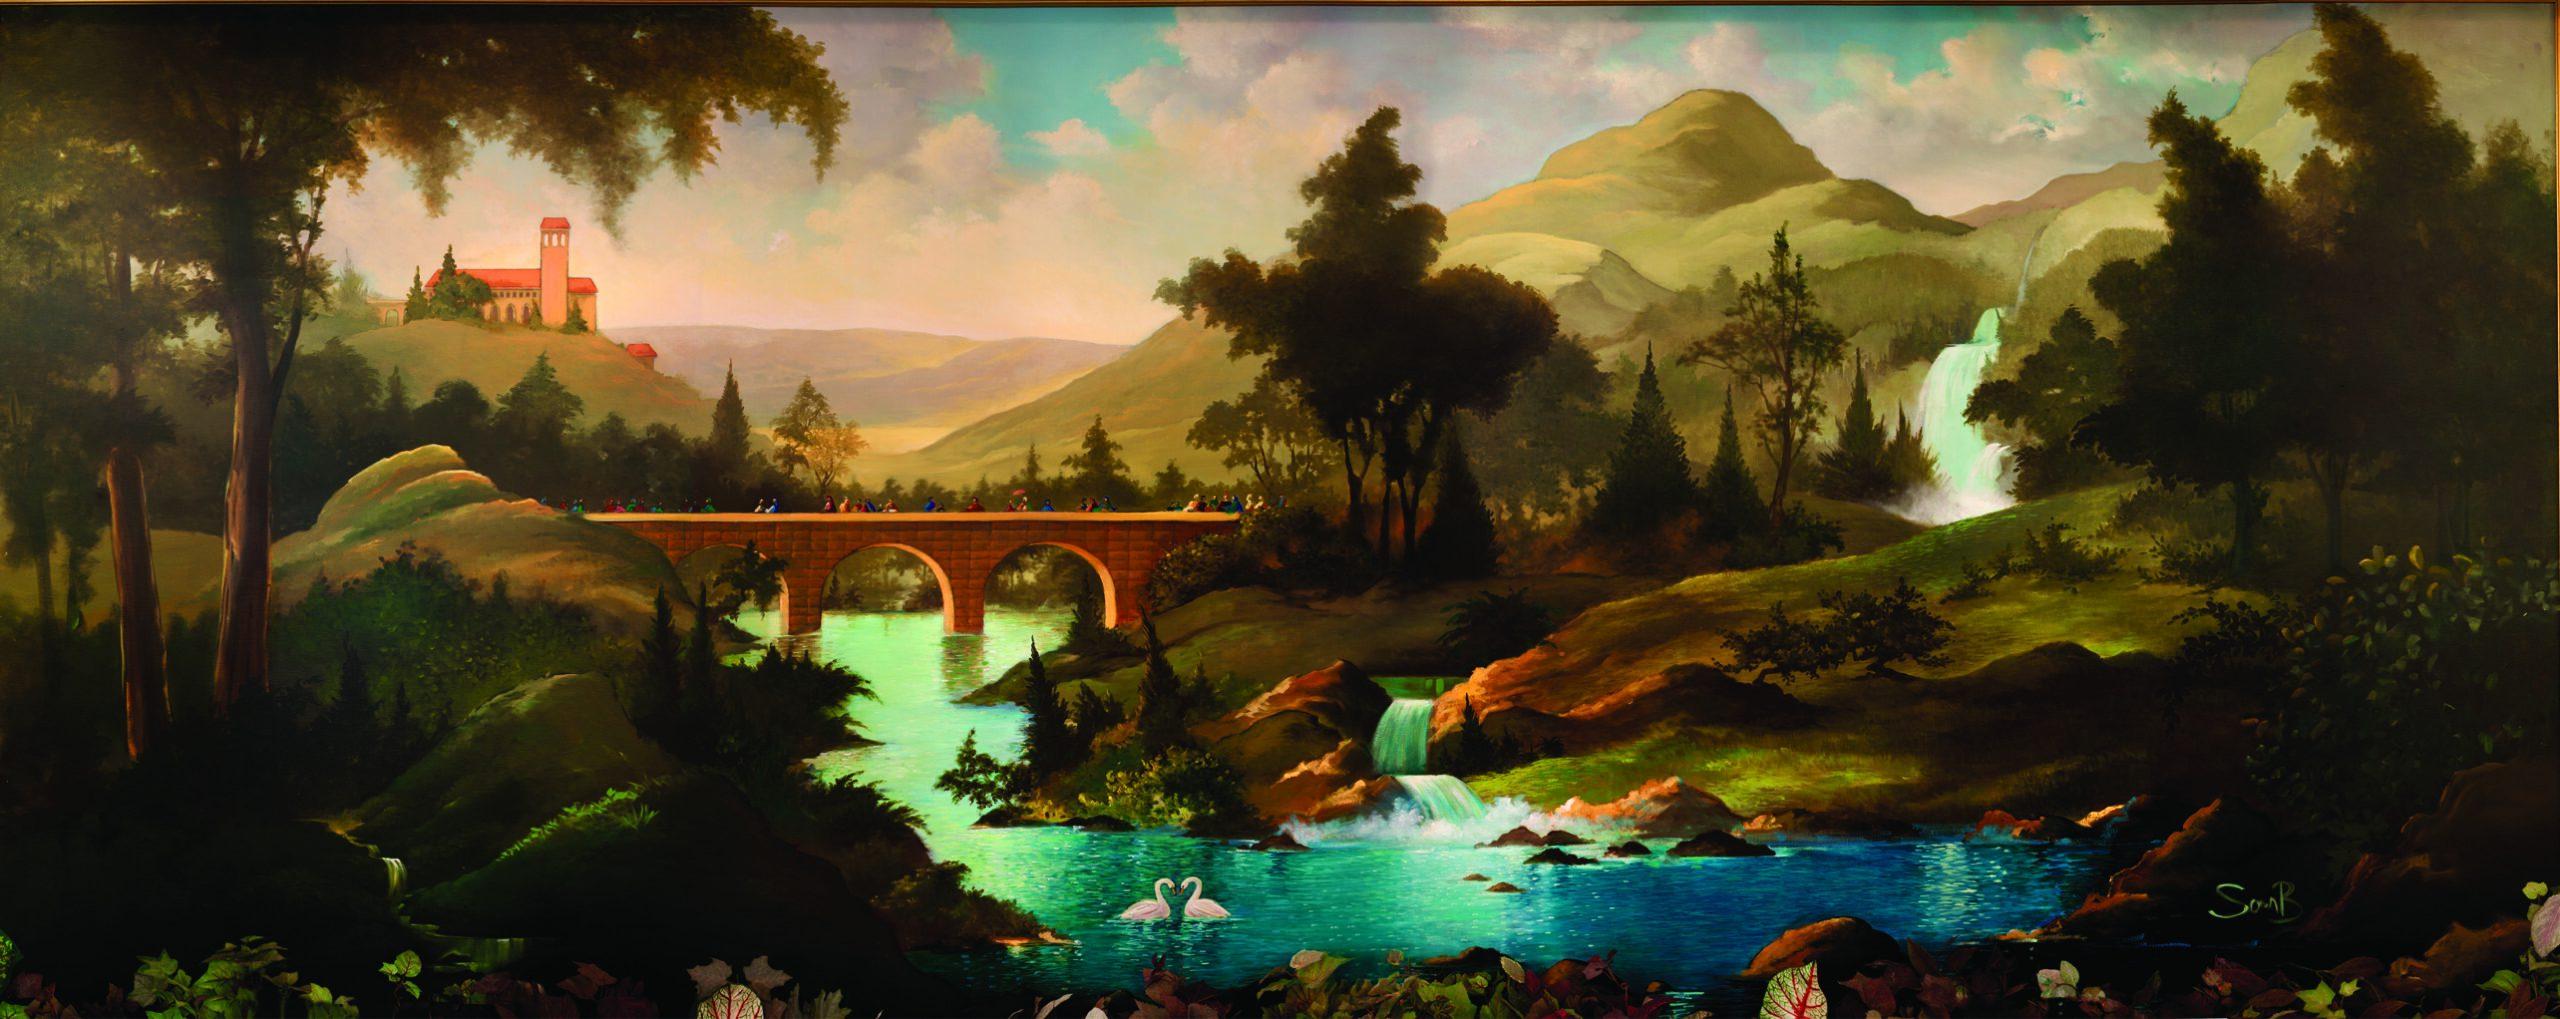 Bridge to Eternal God mural - C